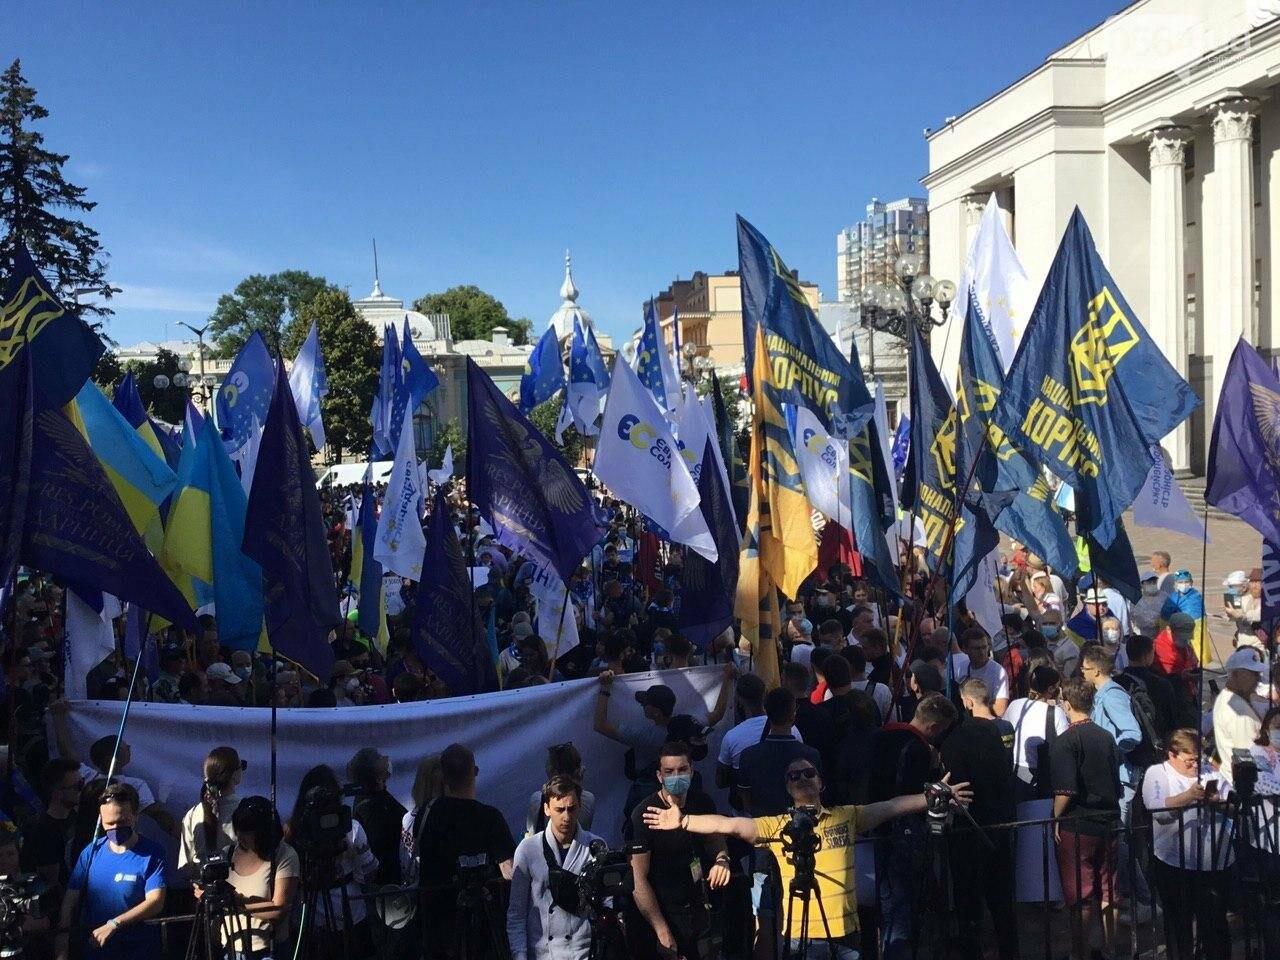 """Руки геть від мови"": под стенами Верховной рады проходит акция протеста, - ФОТО, ВИДЕО, фото-29"